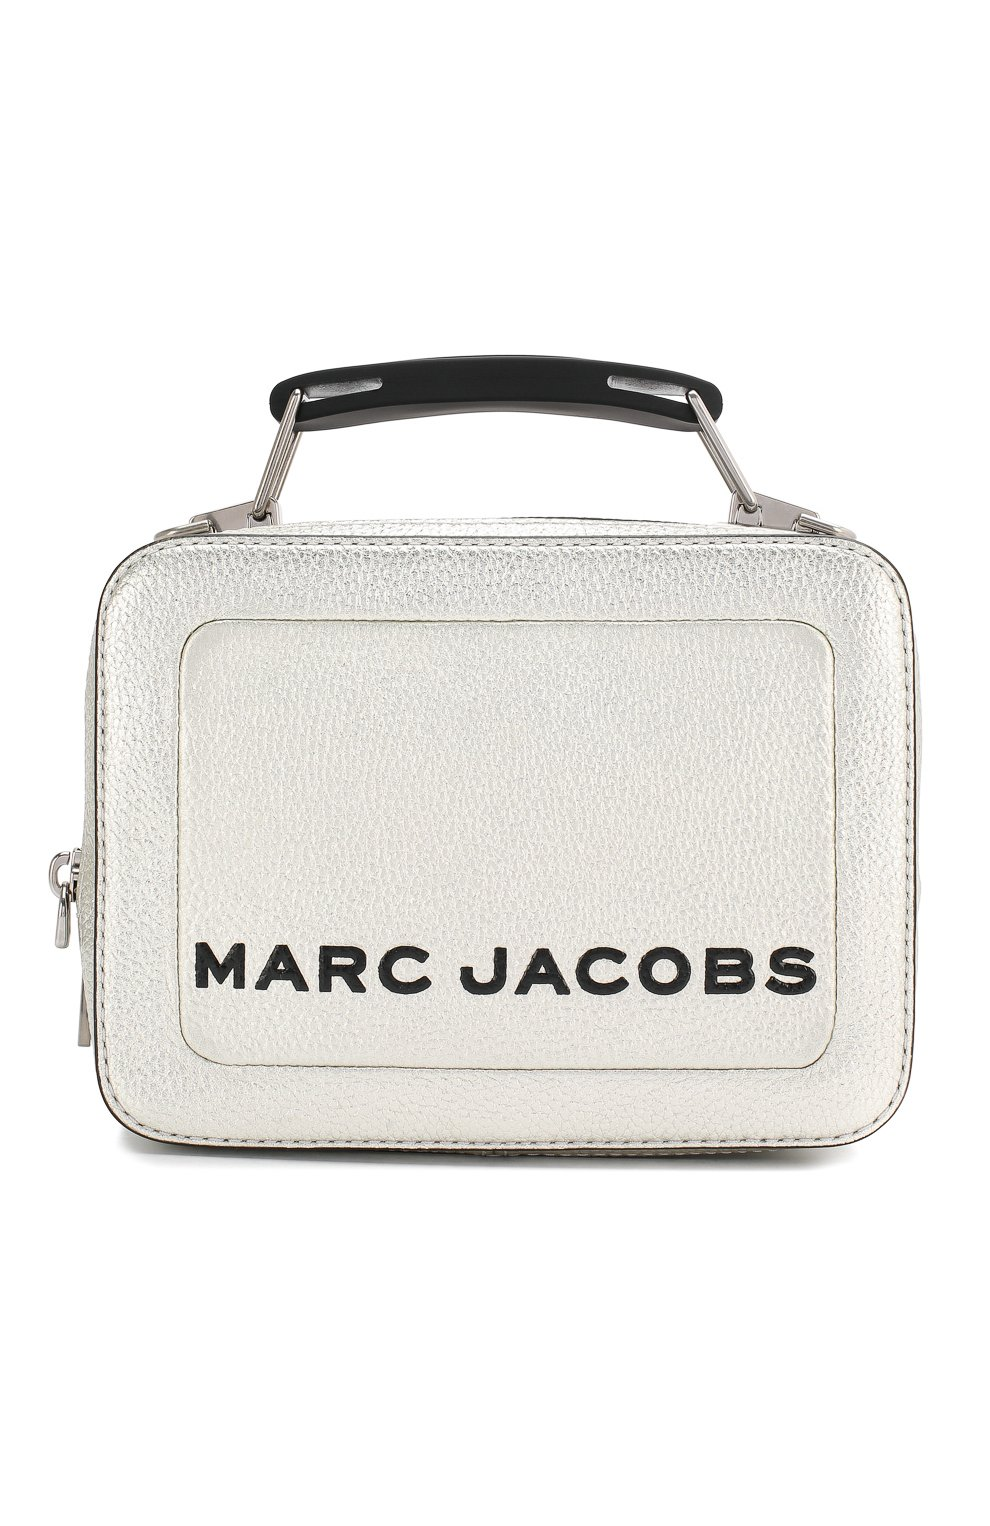 Женская сумка the box 20 MARC JACOBS (THE) серебряного цвета, арт. M0016183 | Фото 1